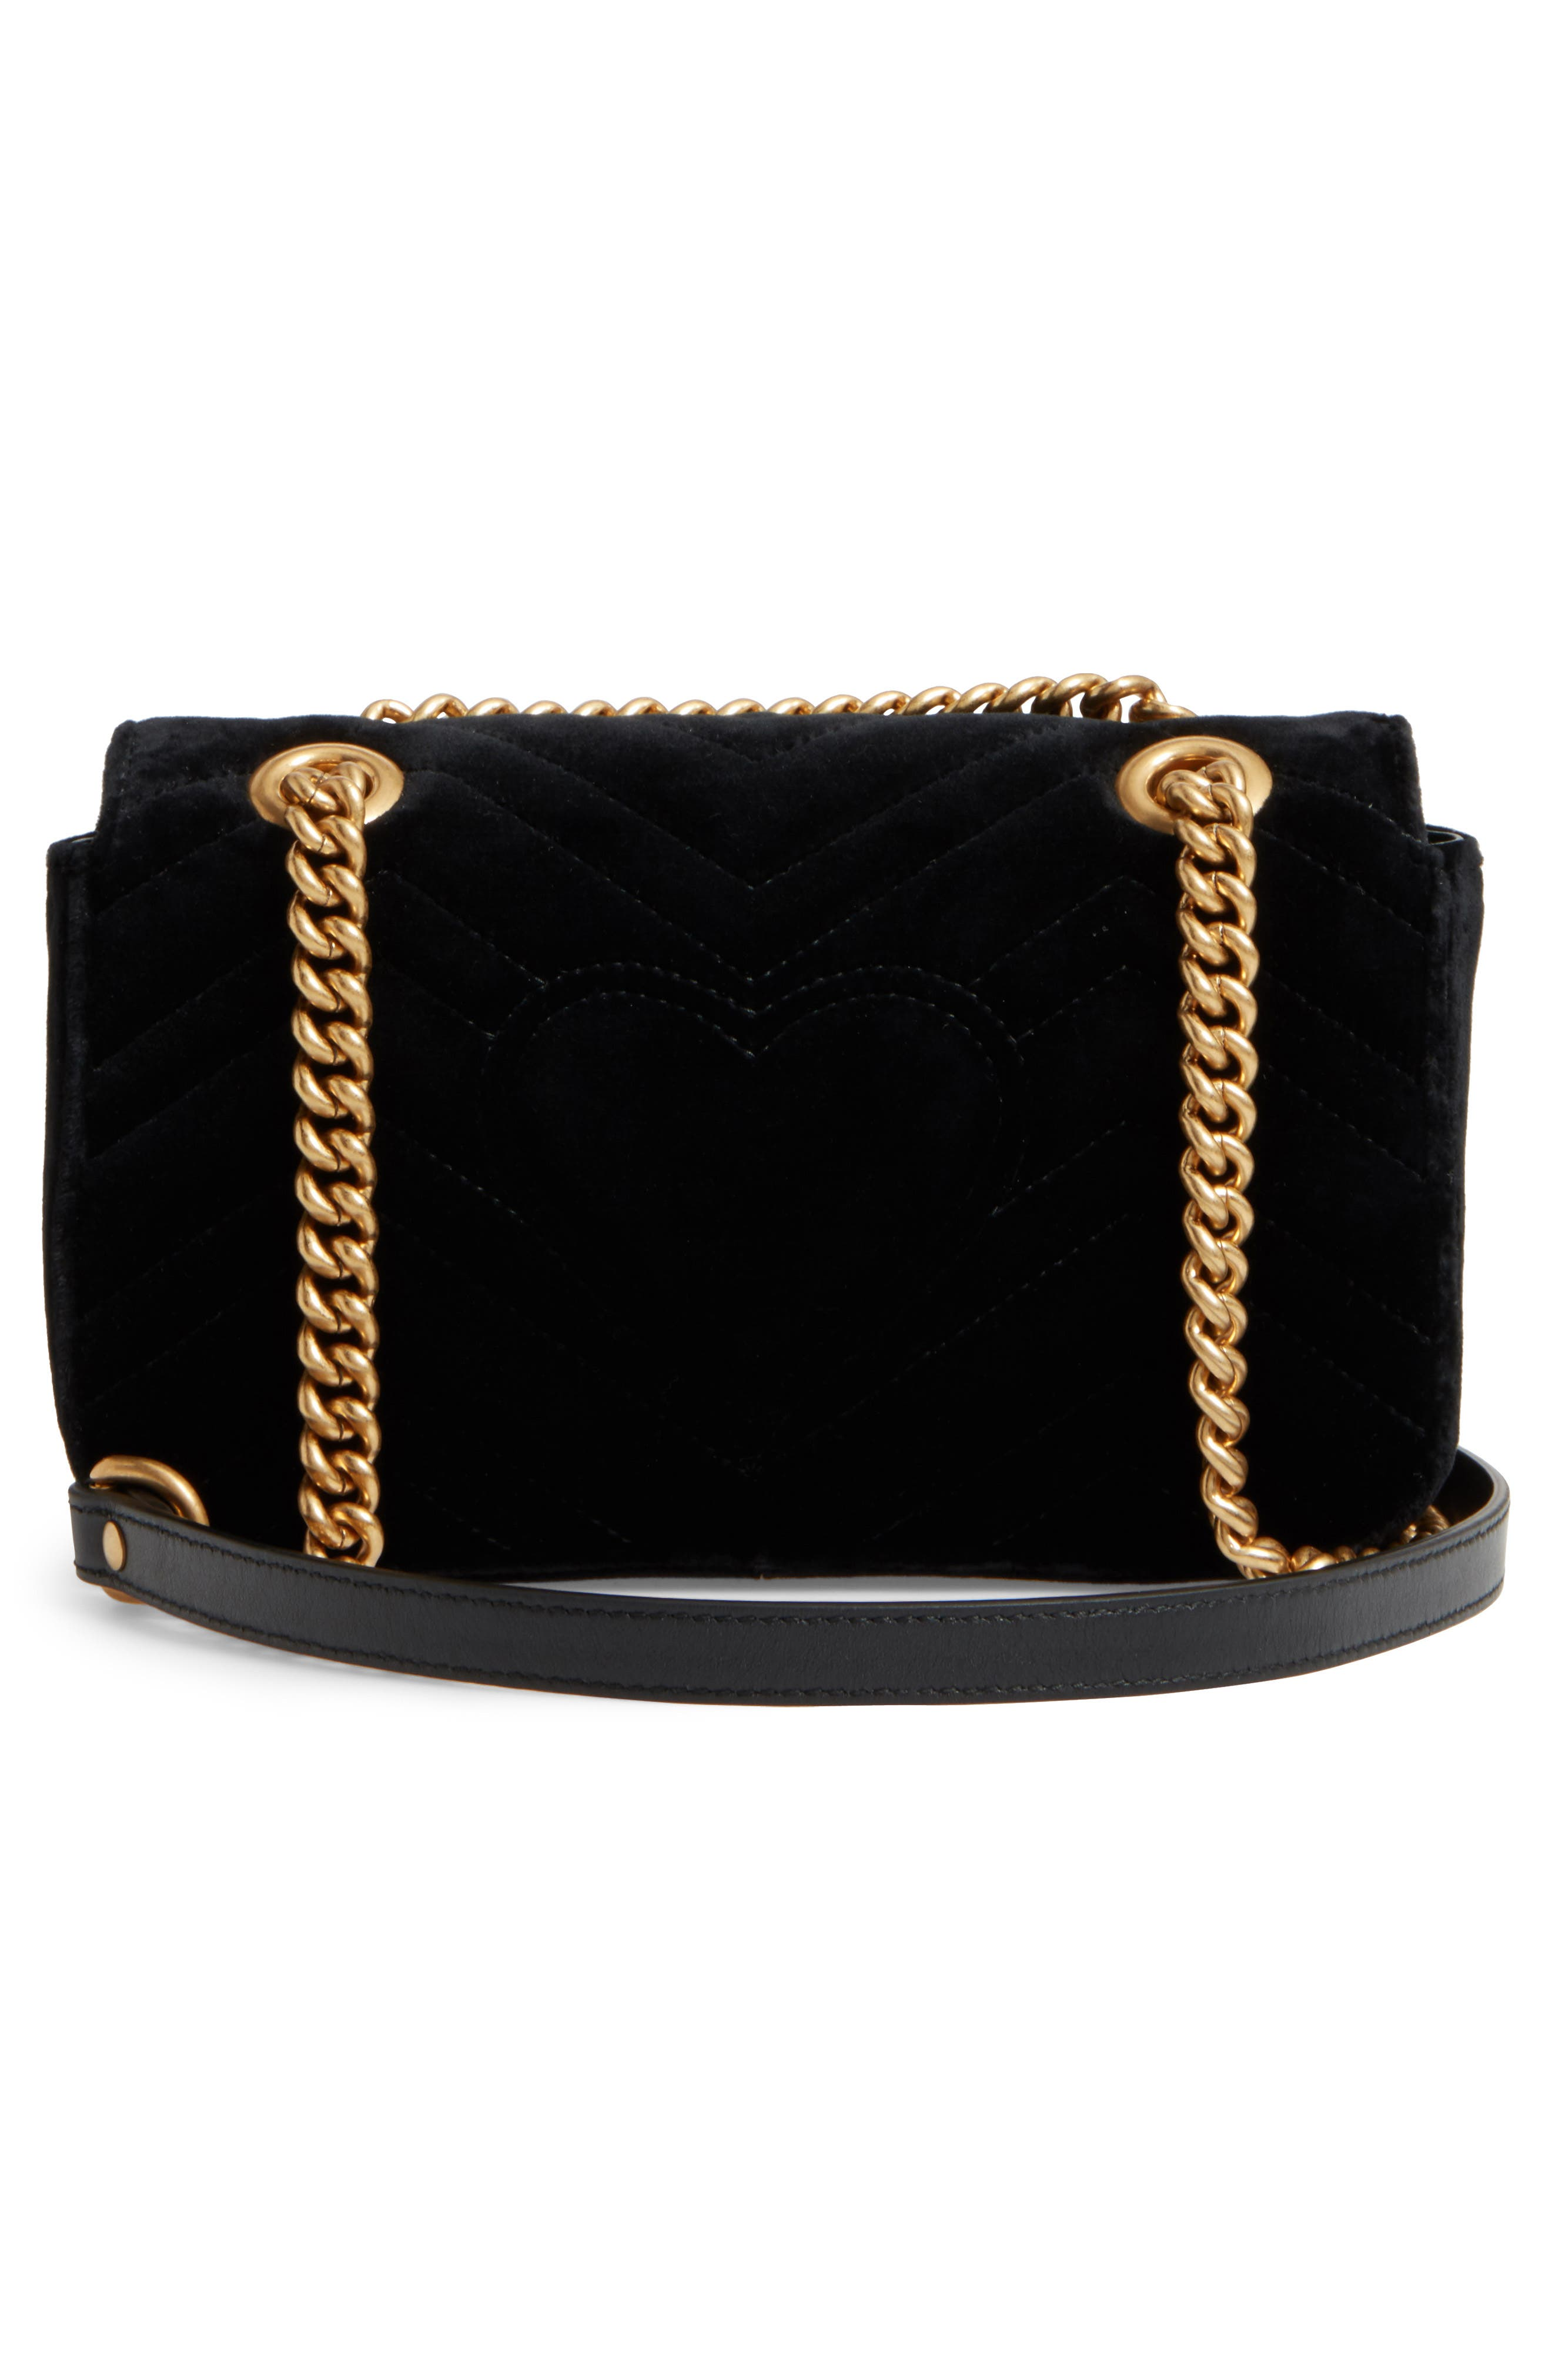 Alternate Image 3  - Gucci Small GG Marmont 2.0 Matelassé Velvet Shoulder Bag